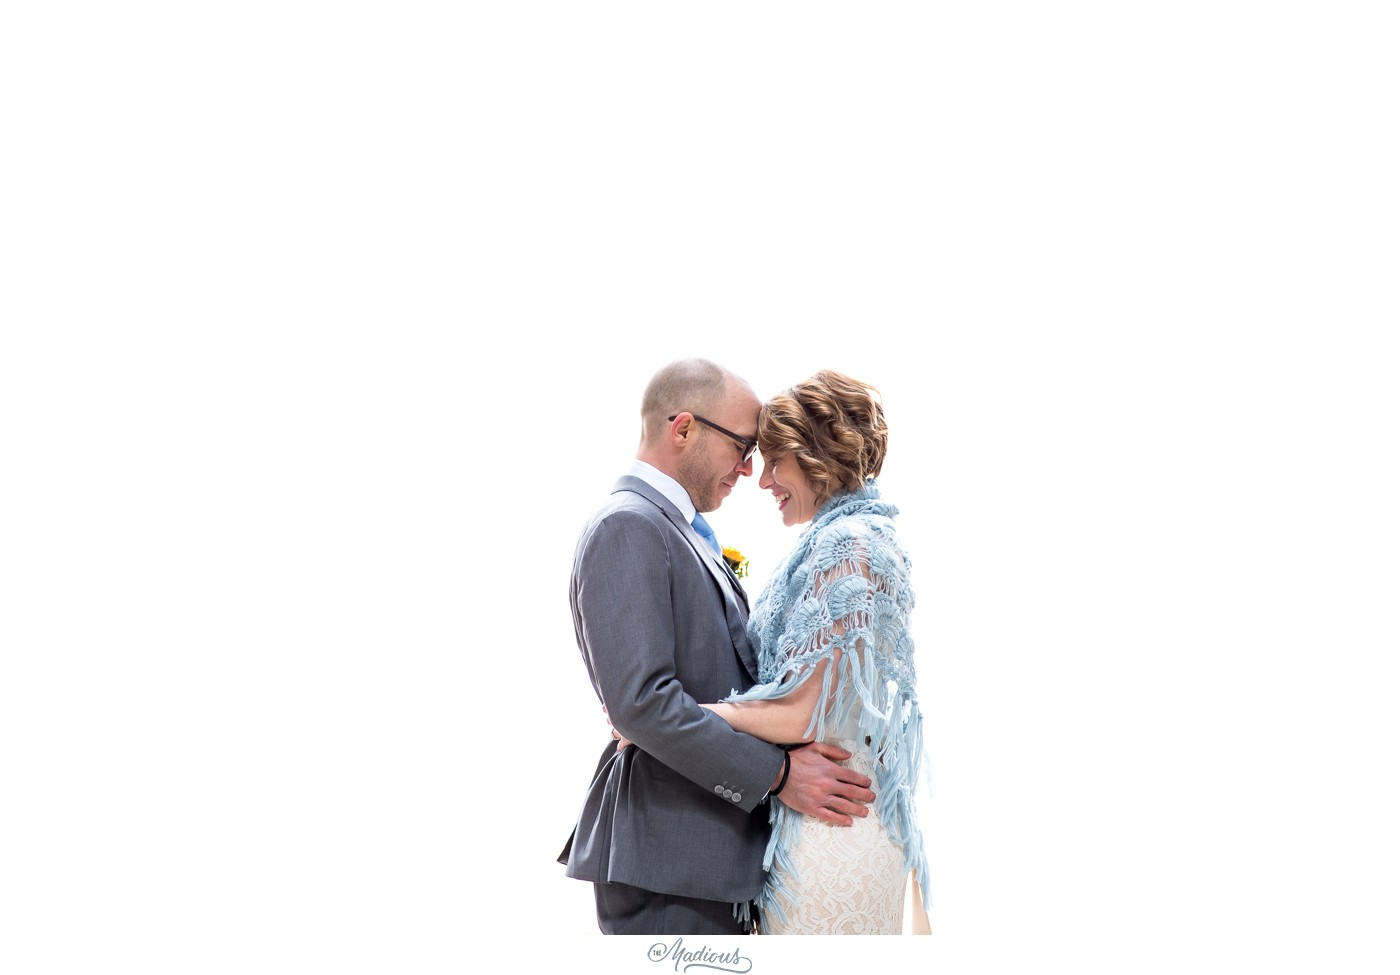 Coradetti_Glass_Spring_Wedding_13.JPG